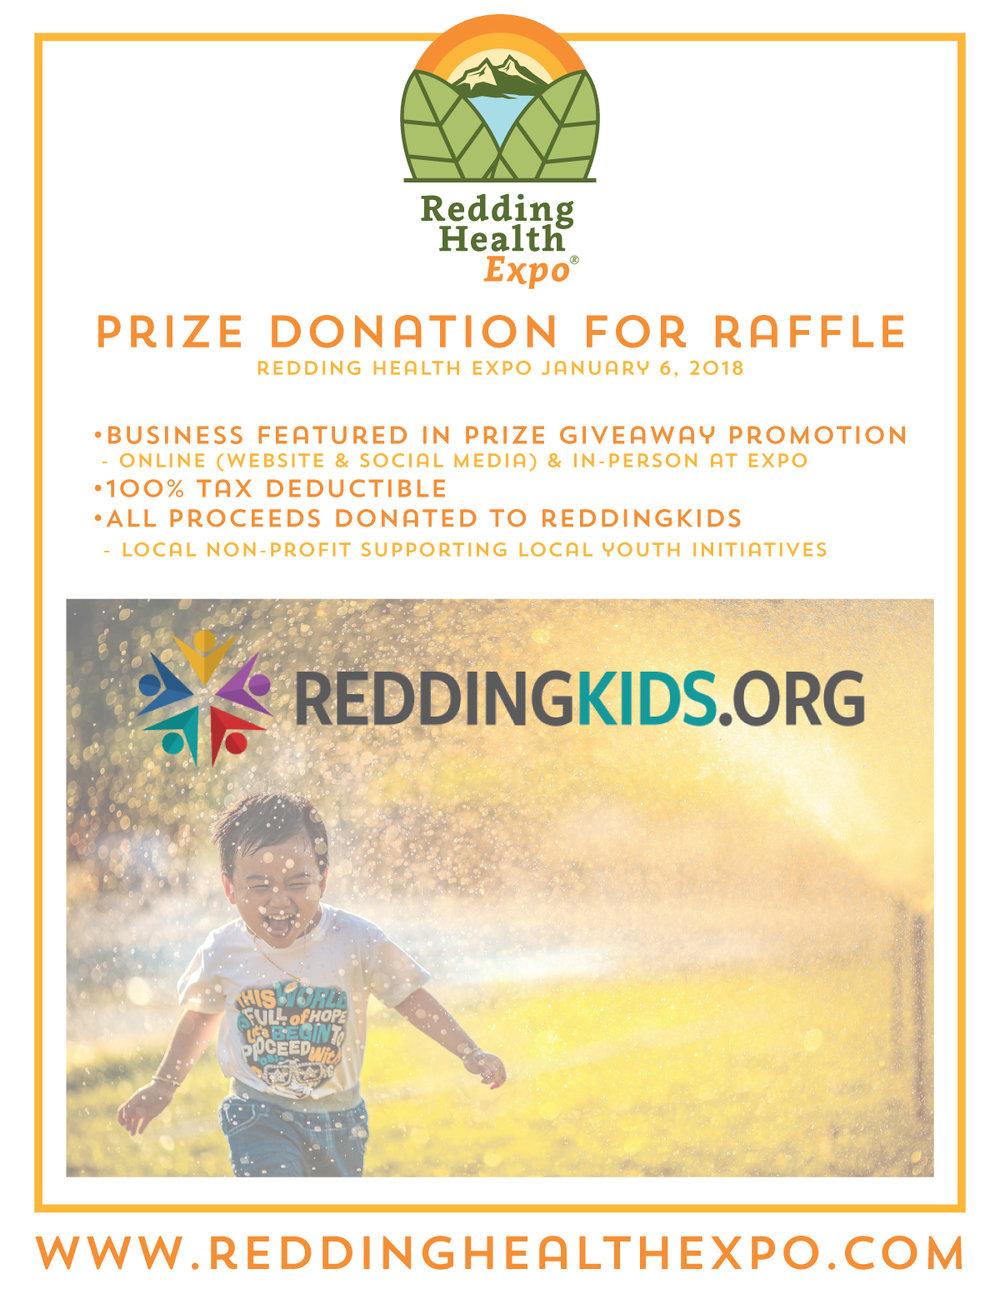 Redding Health Expo Prize Donation.jpg